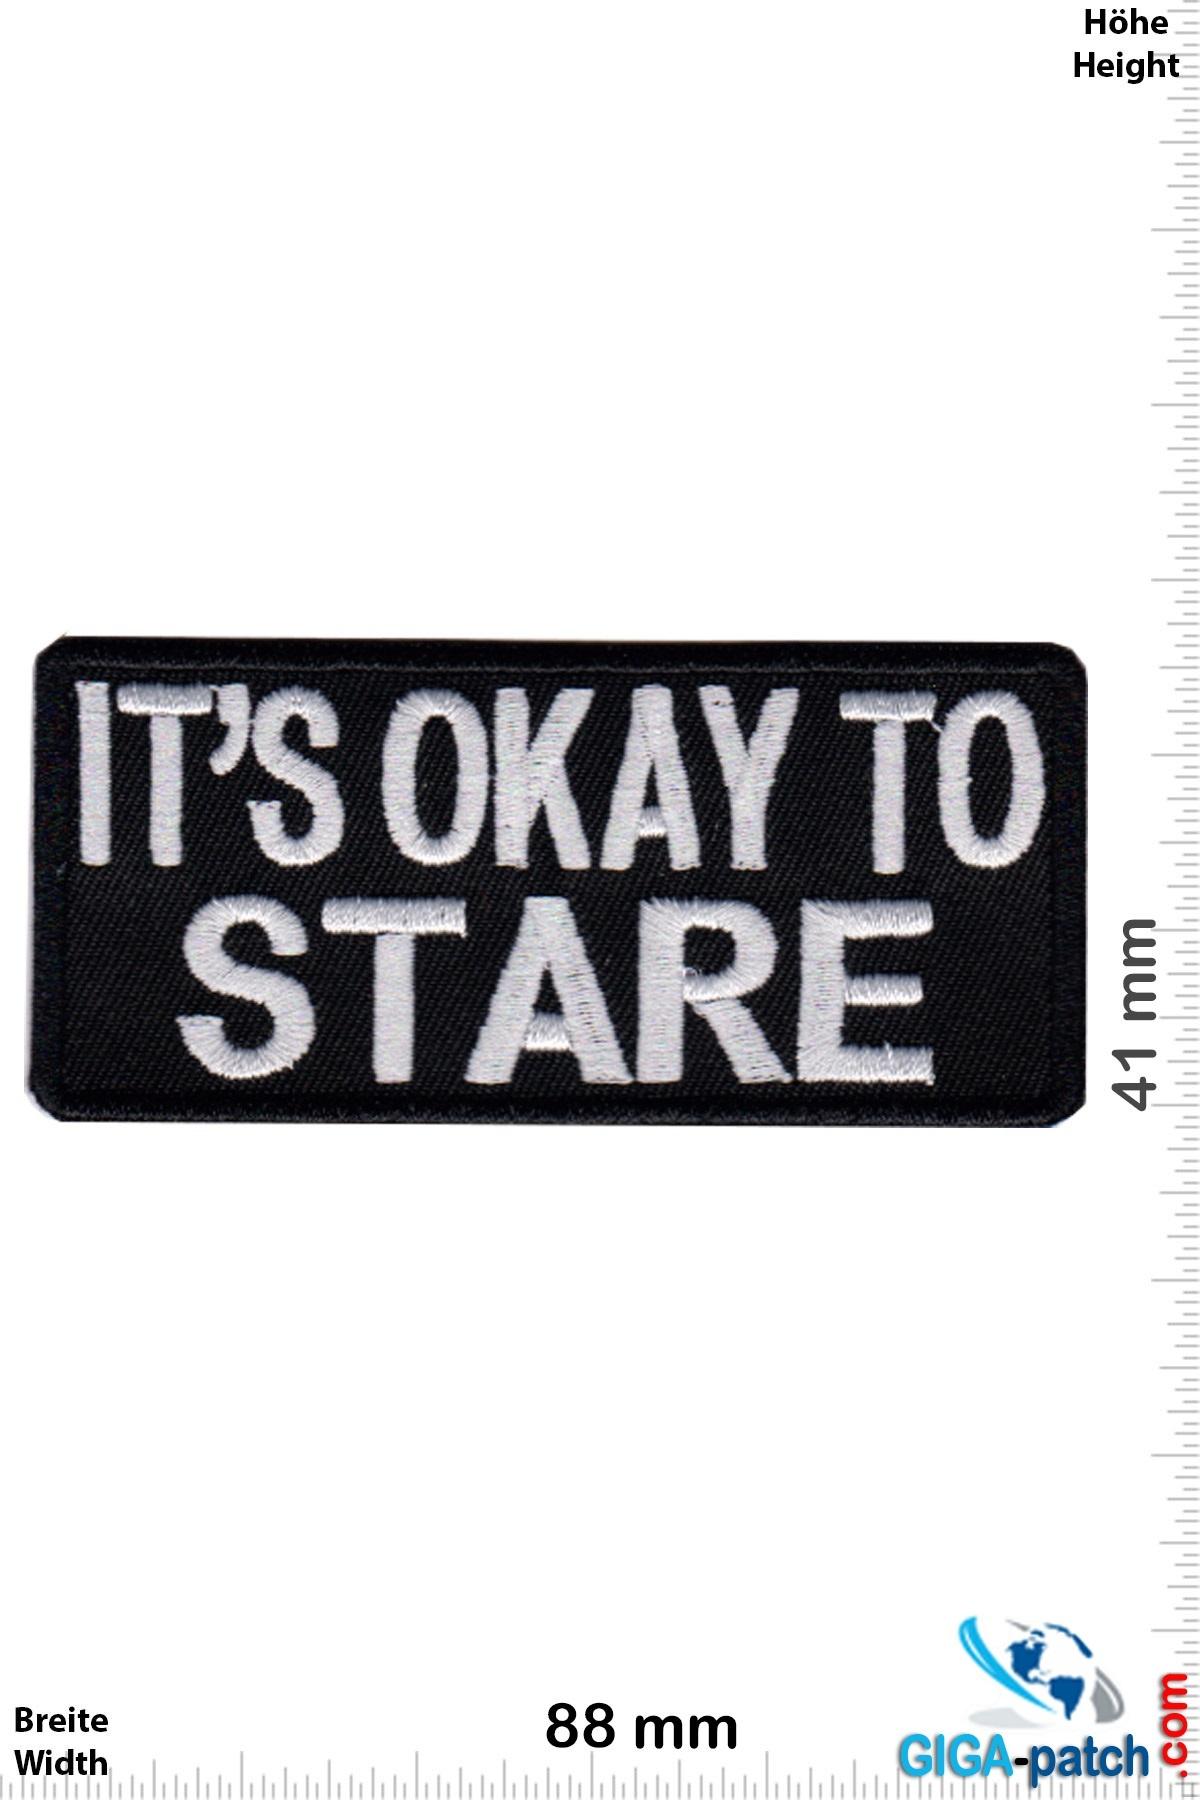 Sprüche, Claims It's OK to STARE